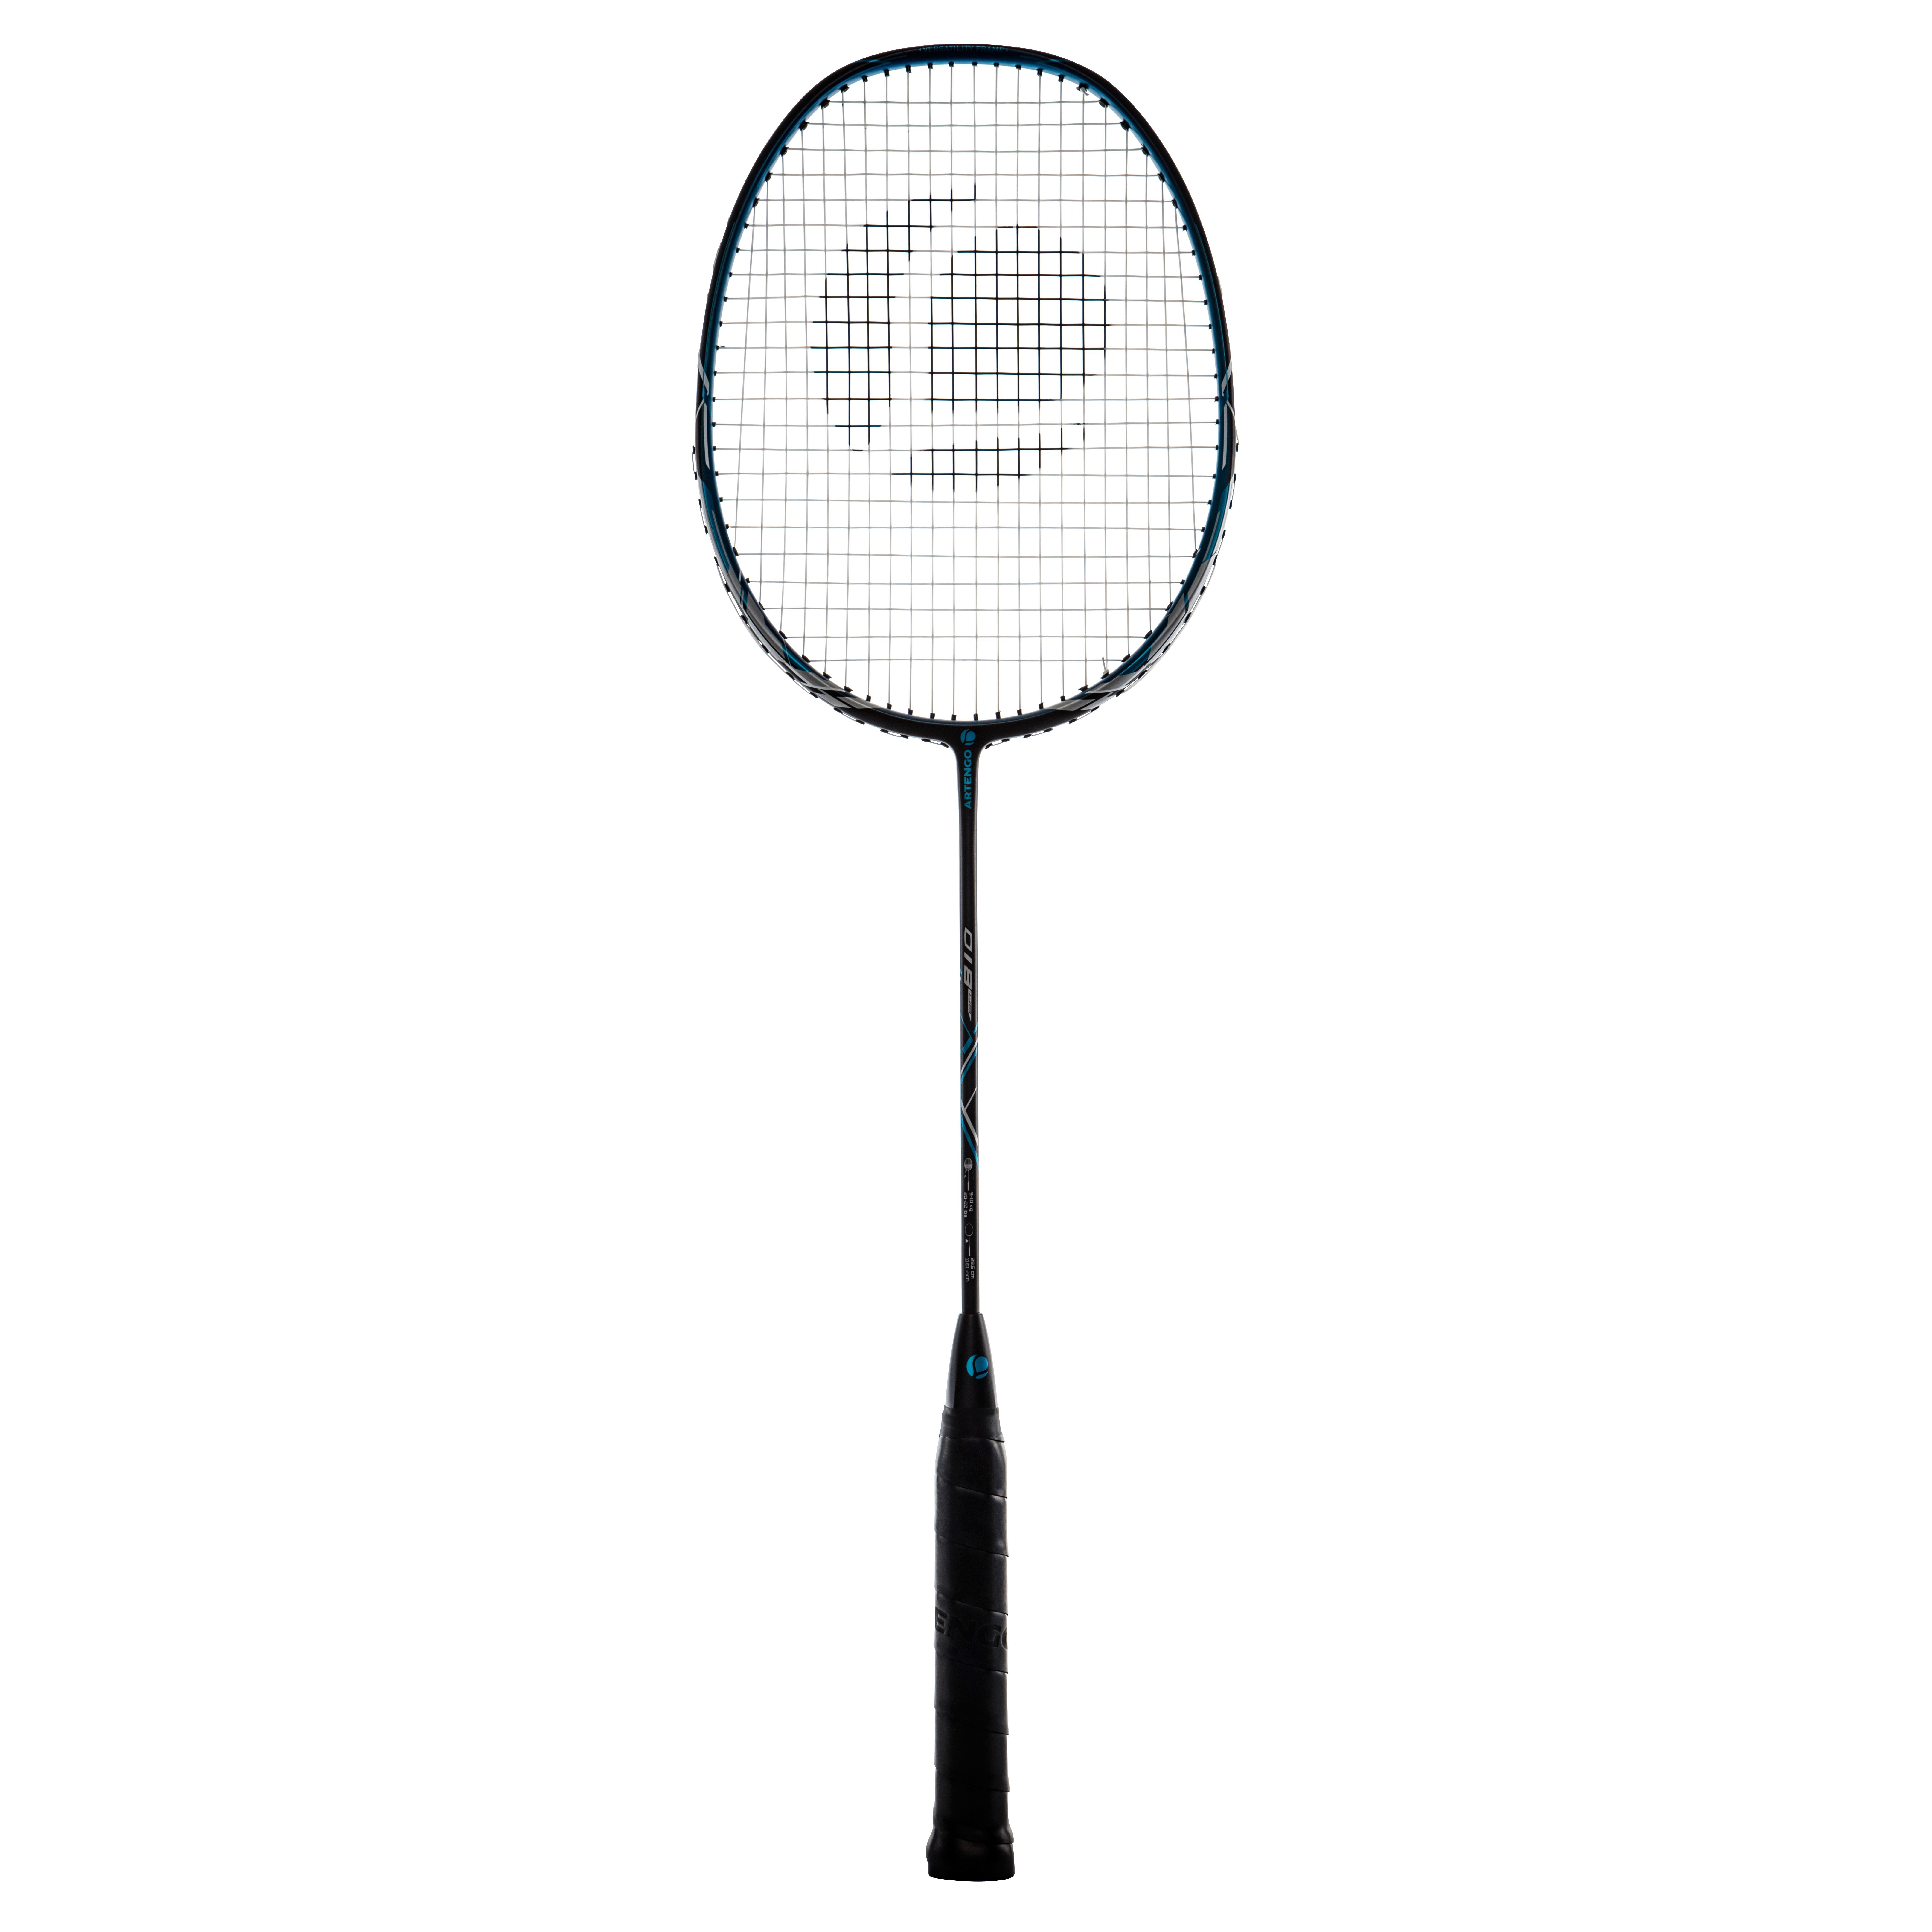 BR810 Badminton Racket - Dark Blue